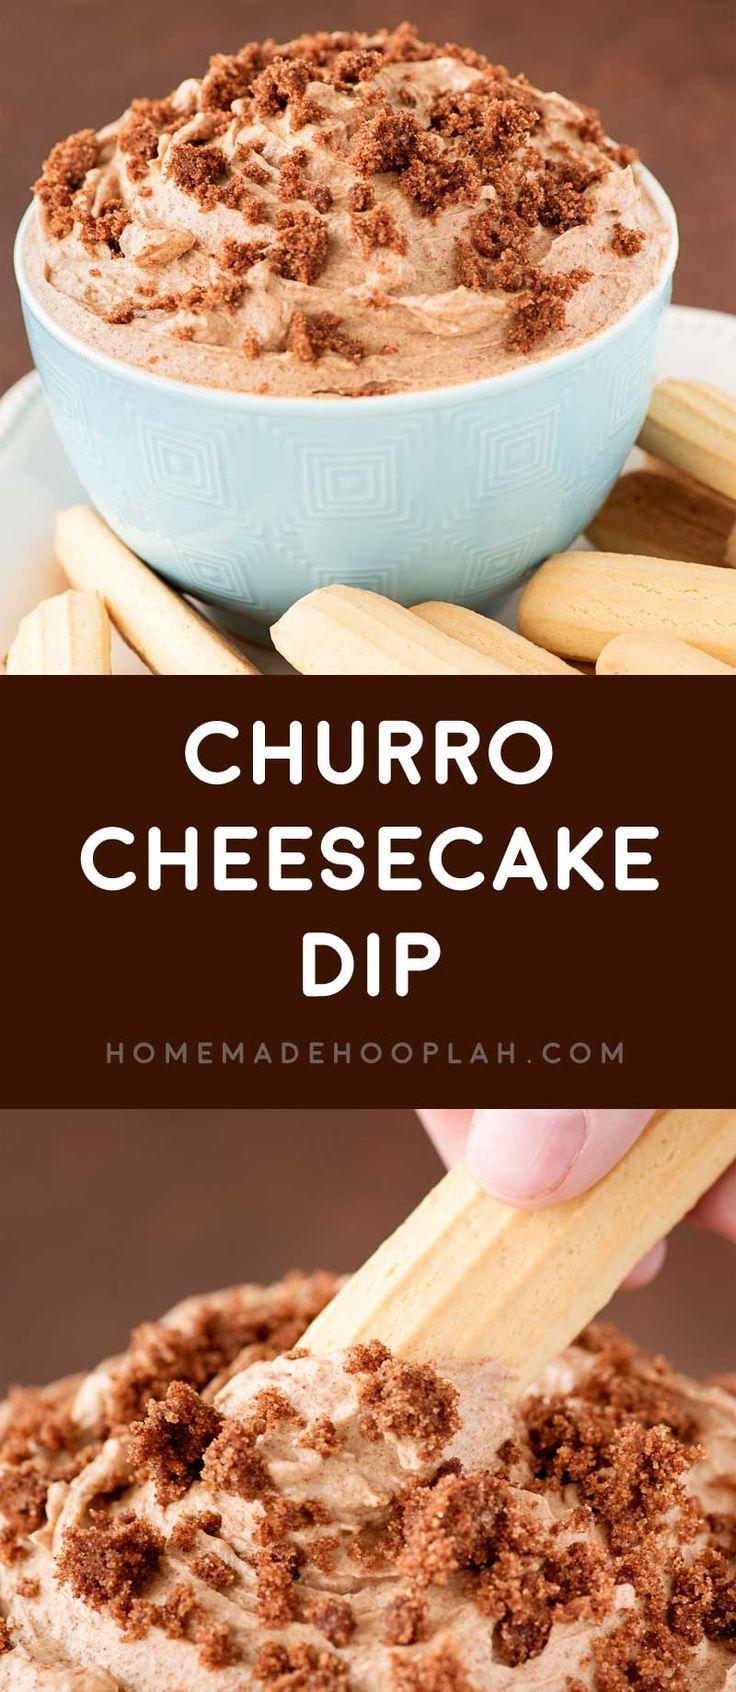 Churro Cheesecake Dip